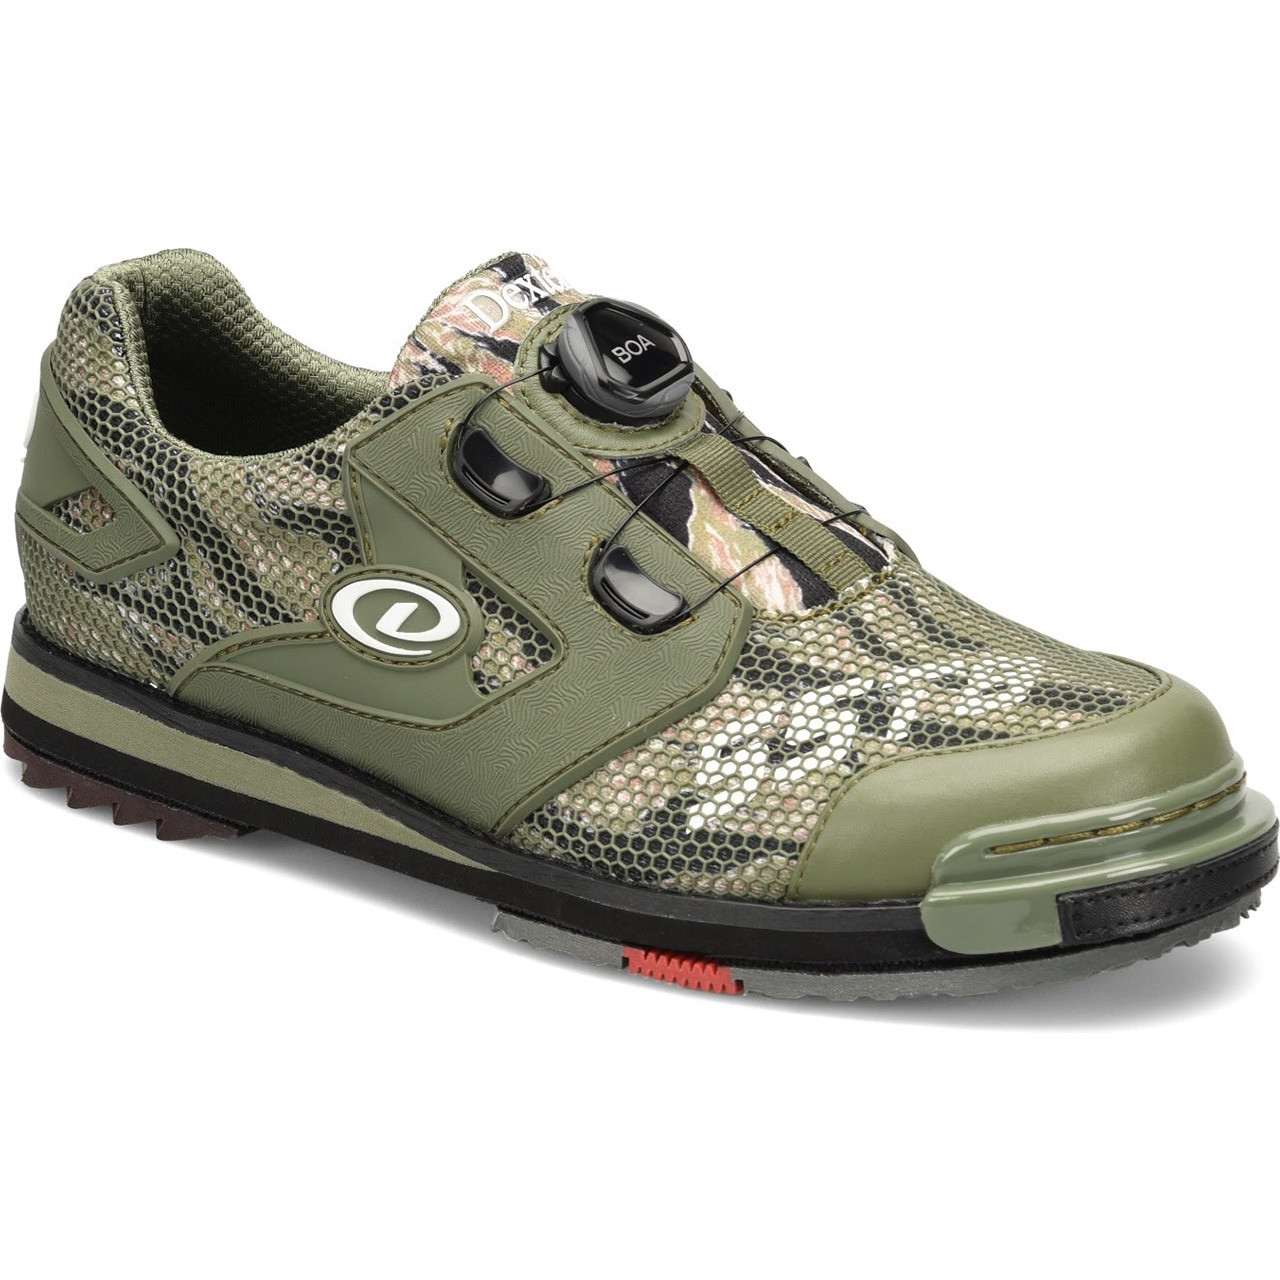 Dexter SST 8 Power-Frame Boa Mens Bowling Shoes Camo